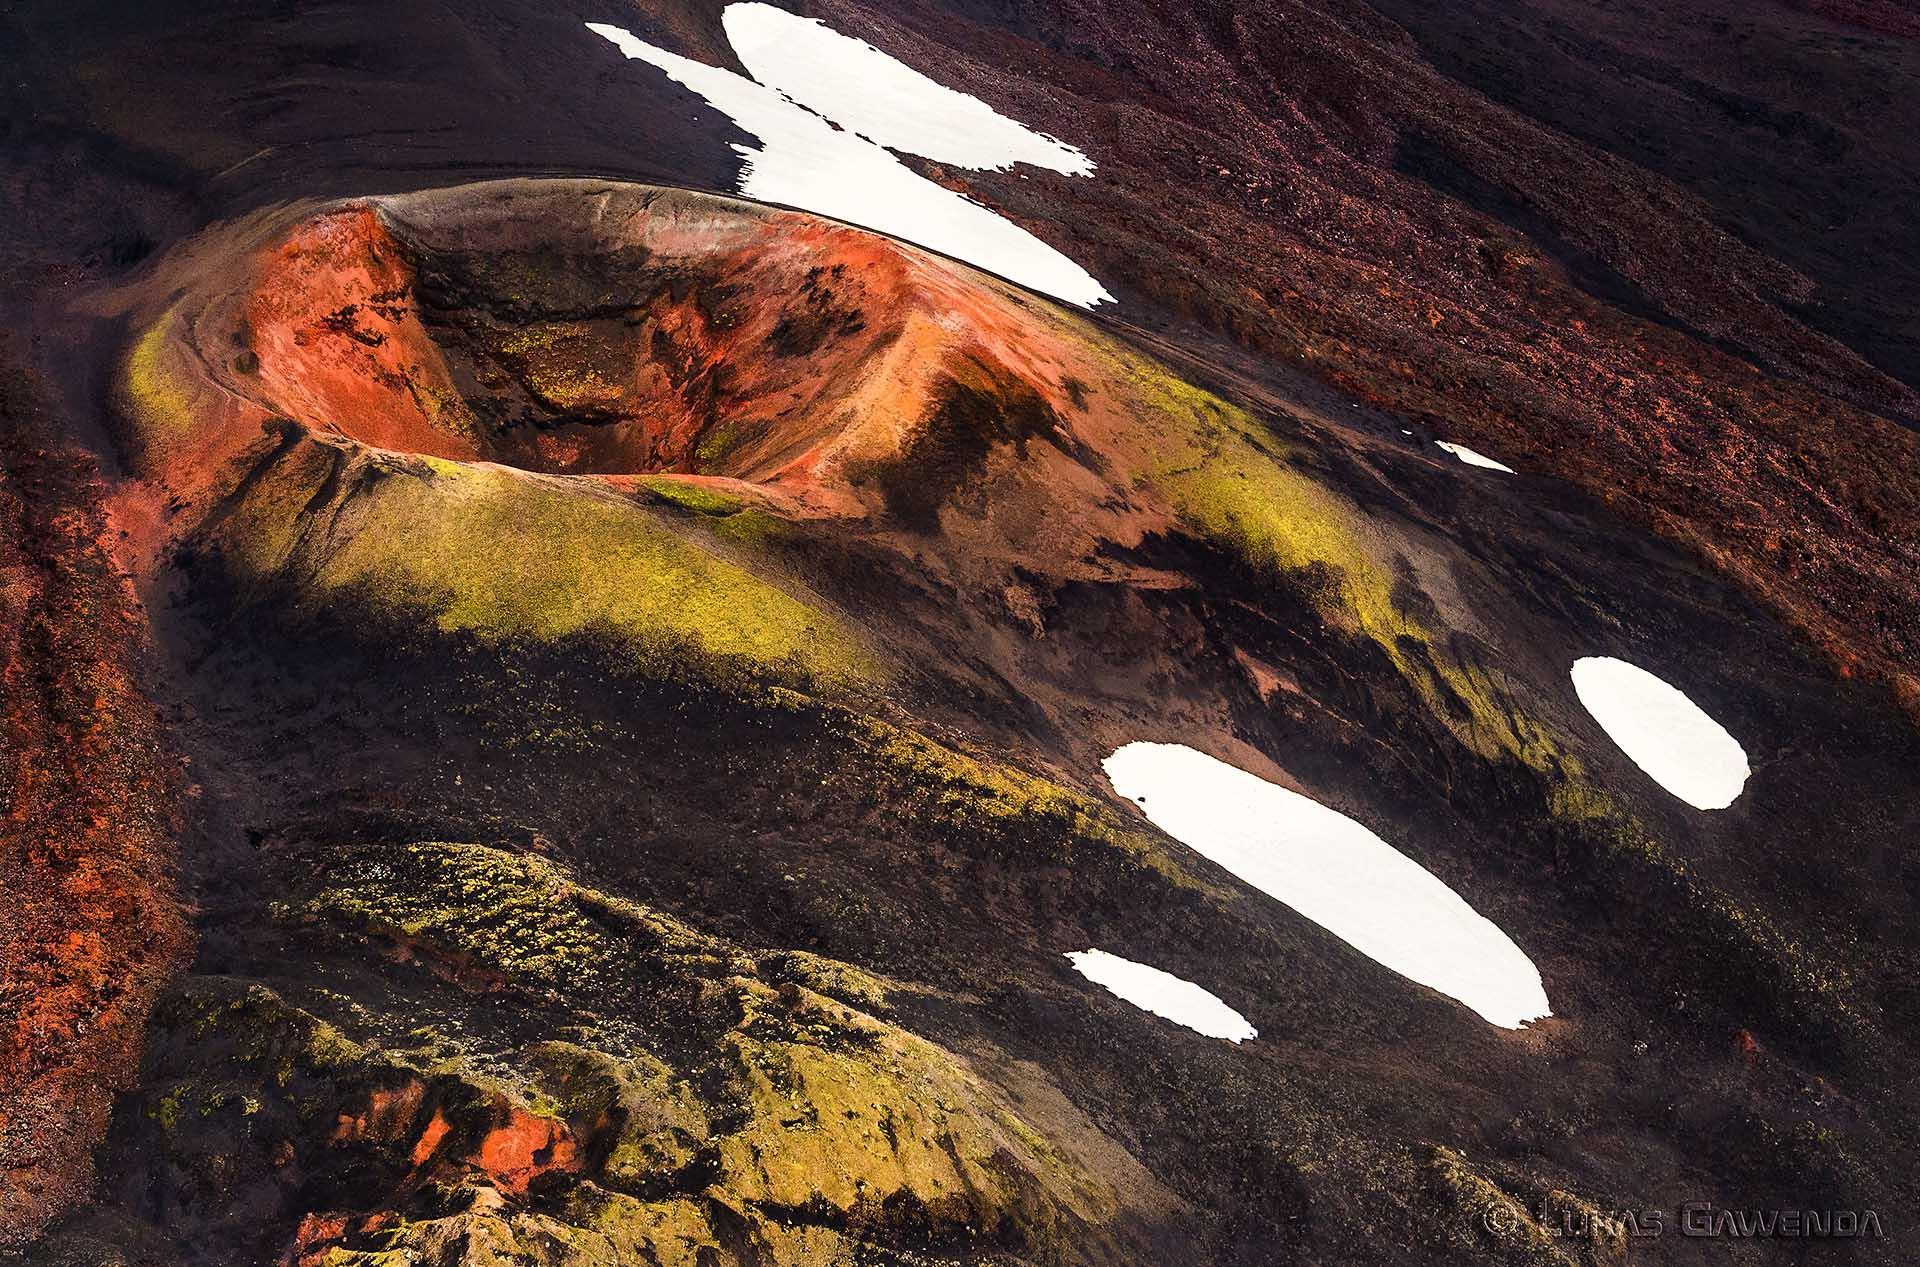 Vulkankrater - Aerials - Lukas Gawenda